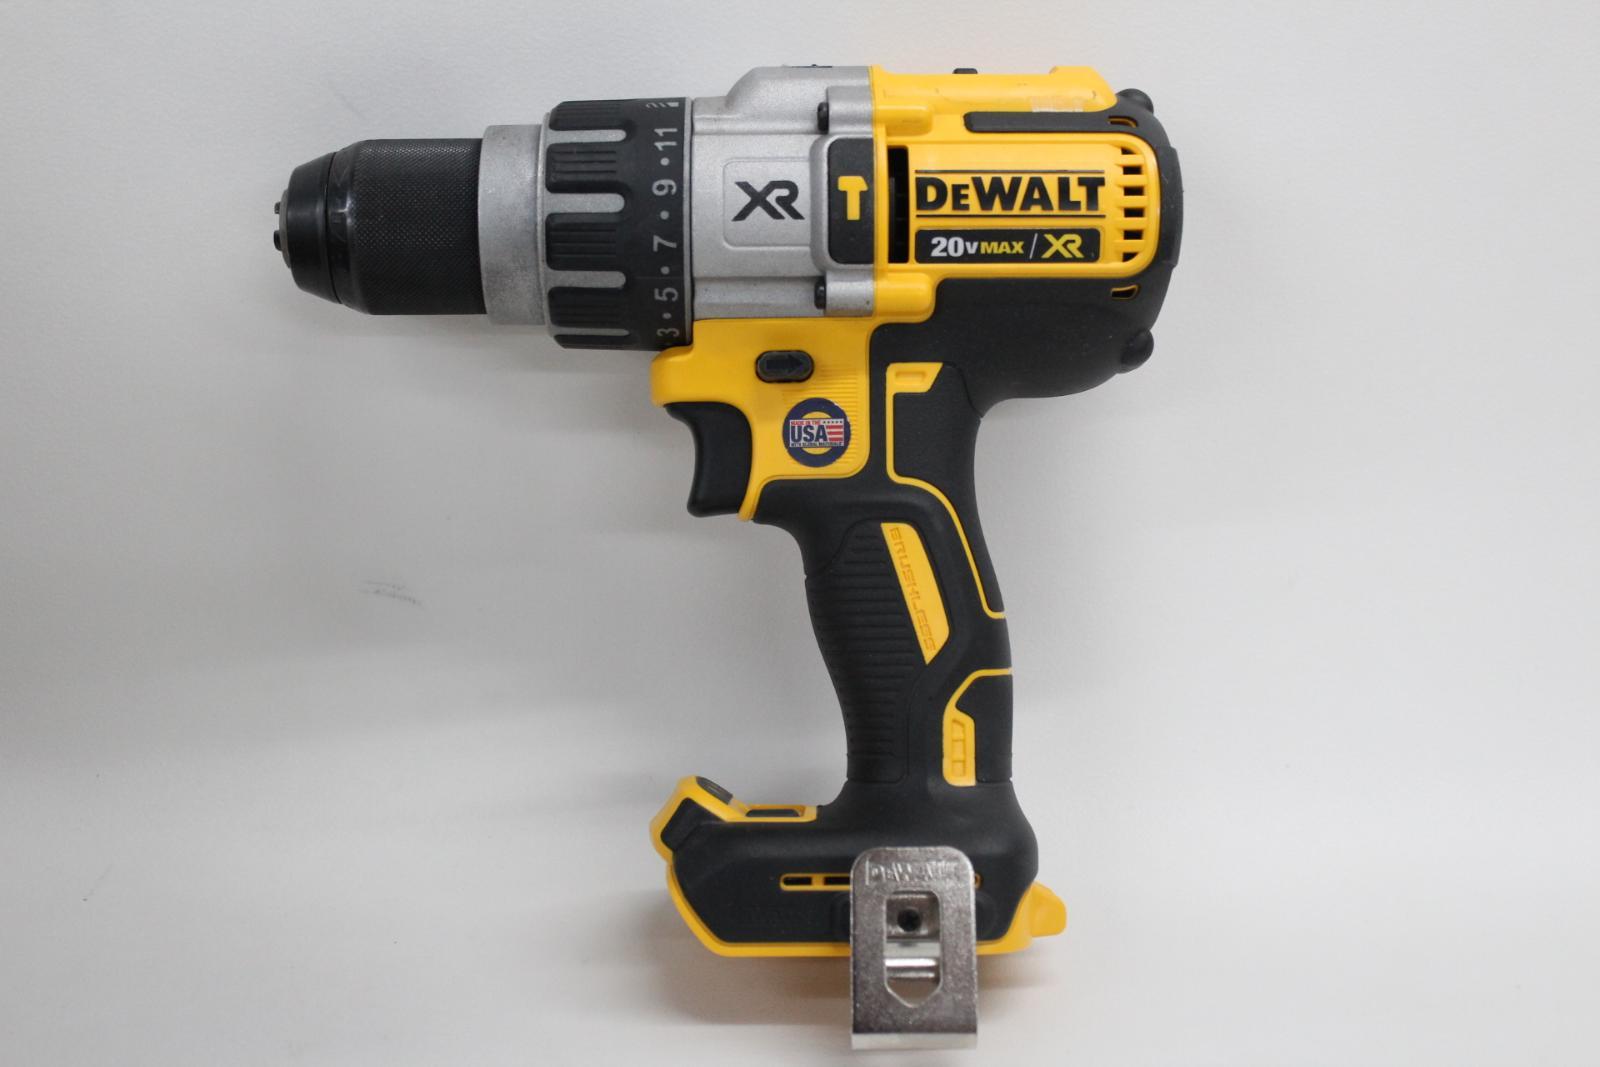 DEWALT-1-2-034-Brushless-Xr-Martillo-Taladro-Inalambrico-Controlador-Inalambrico-Modelo-DCD996-20v miniatura 2